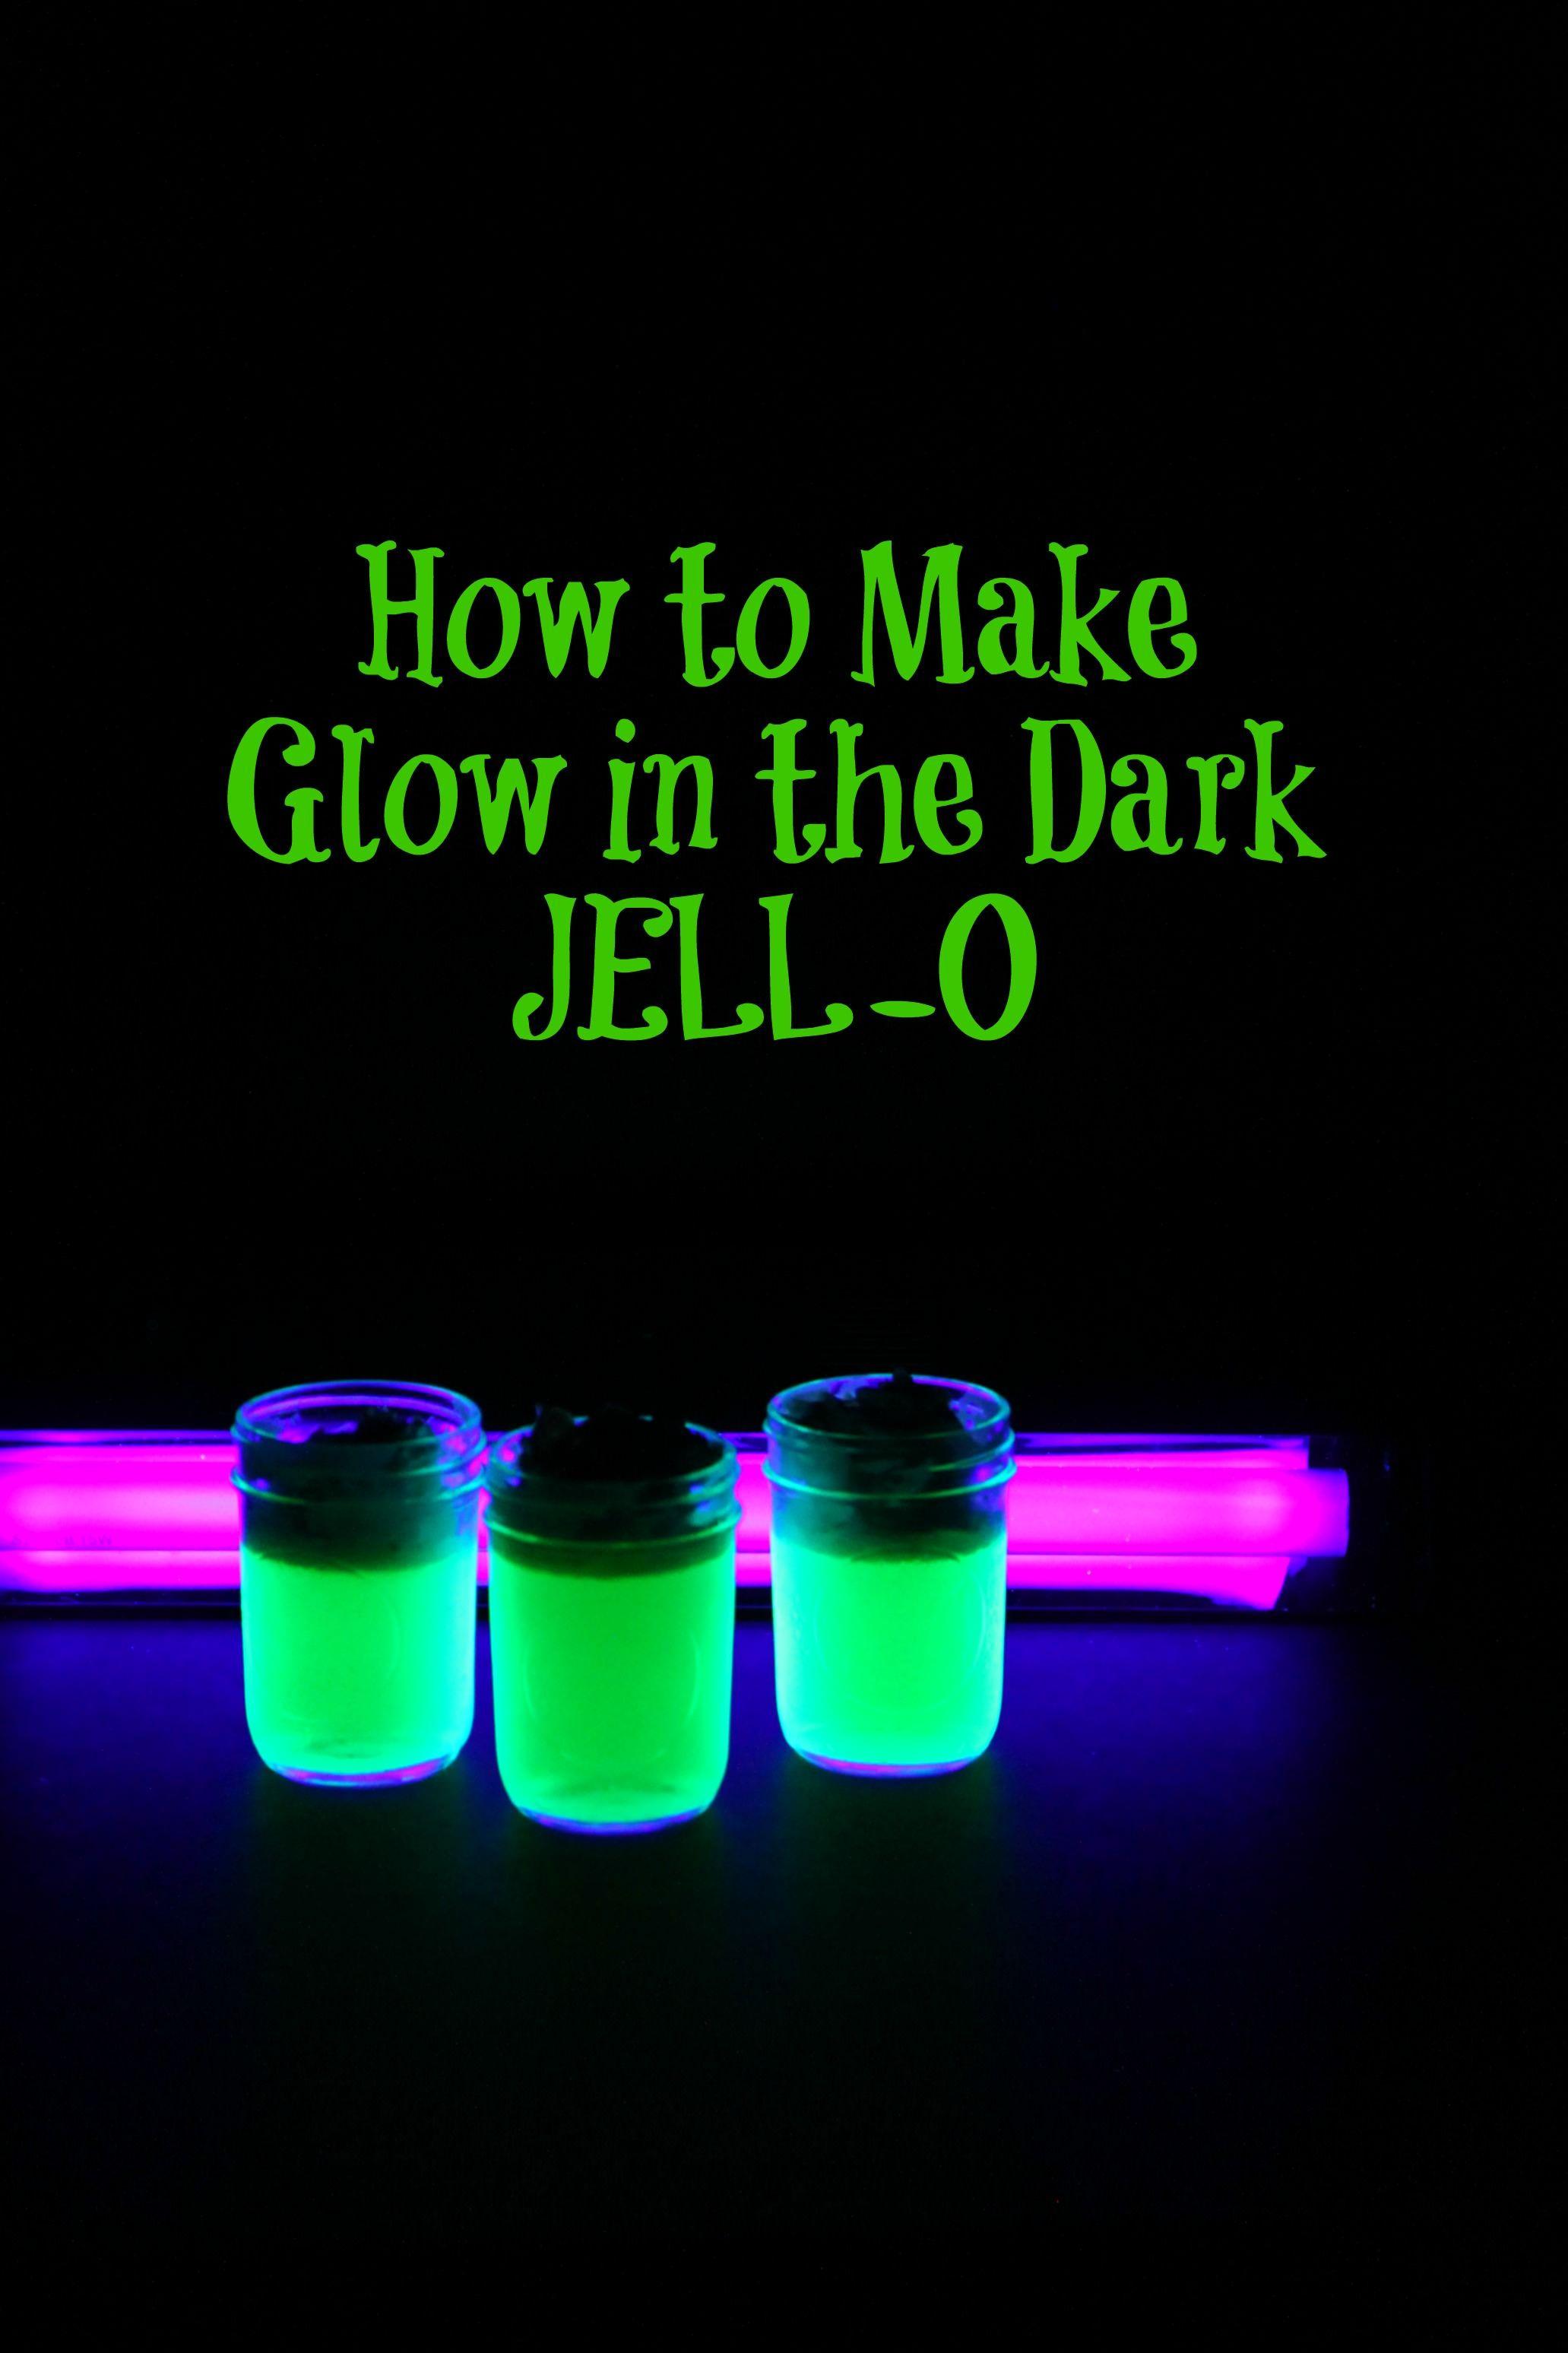 Glow in the Dark JELLO Recipe Girls magazine Jello and Dark